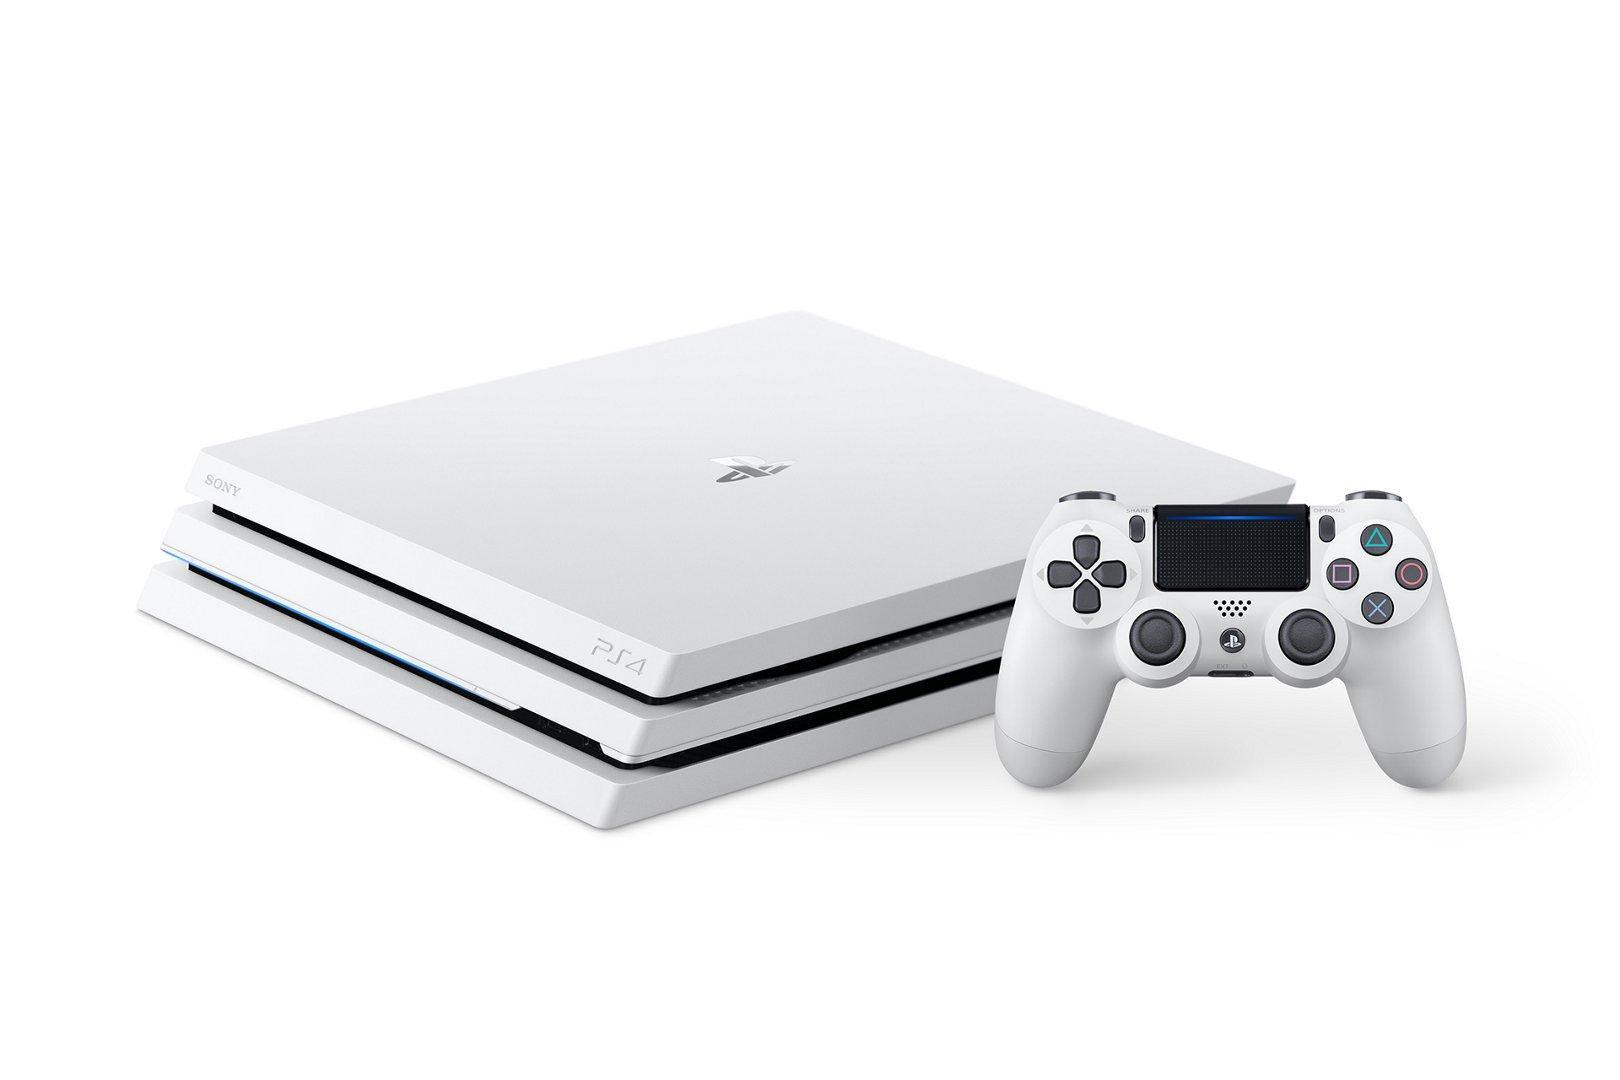 PlayStation 4 Pro Glacier White 1TB $299.99